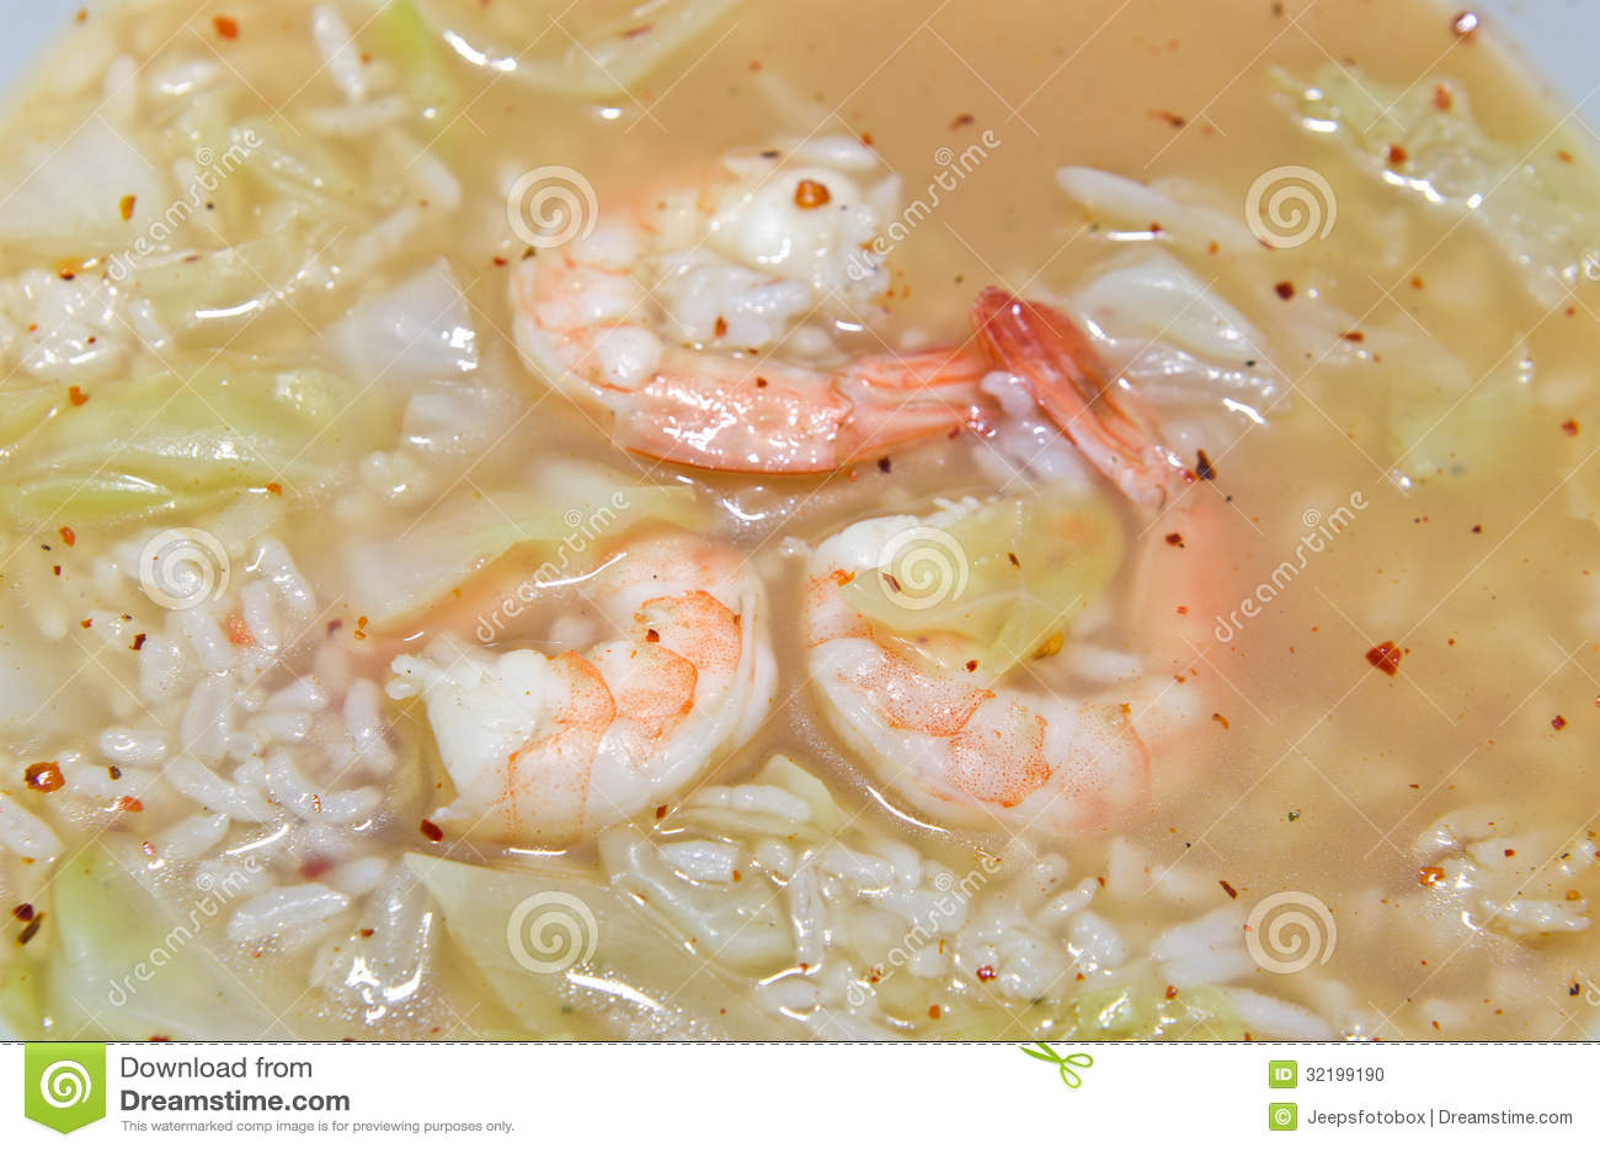 Rice Shoup With Shrimp Stock Photo - Image: 32199190